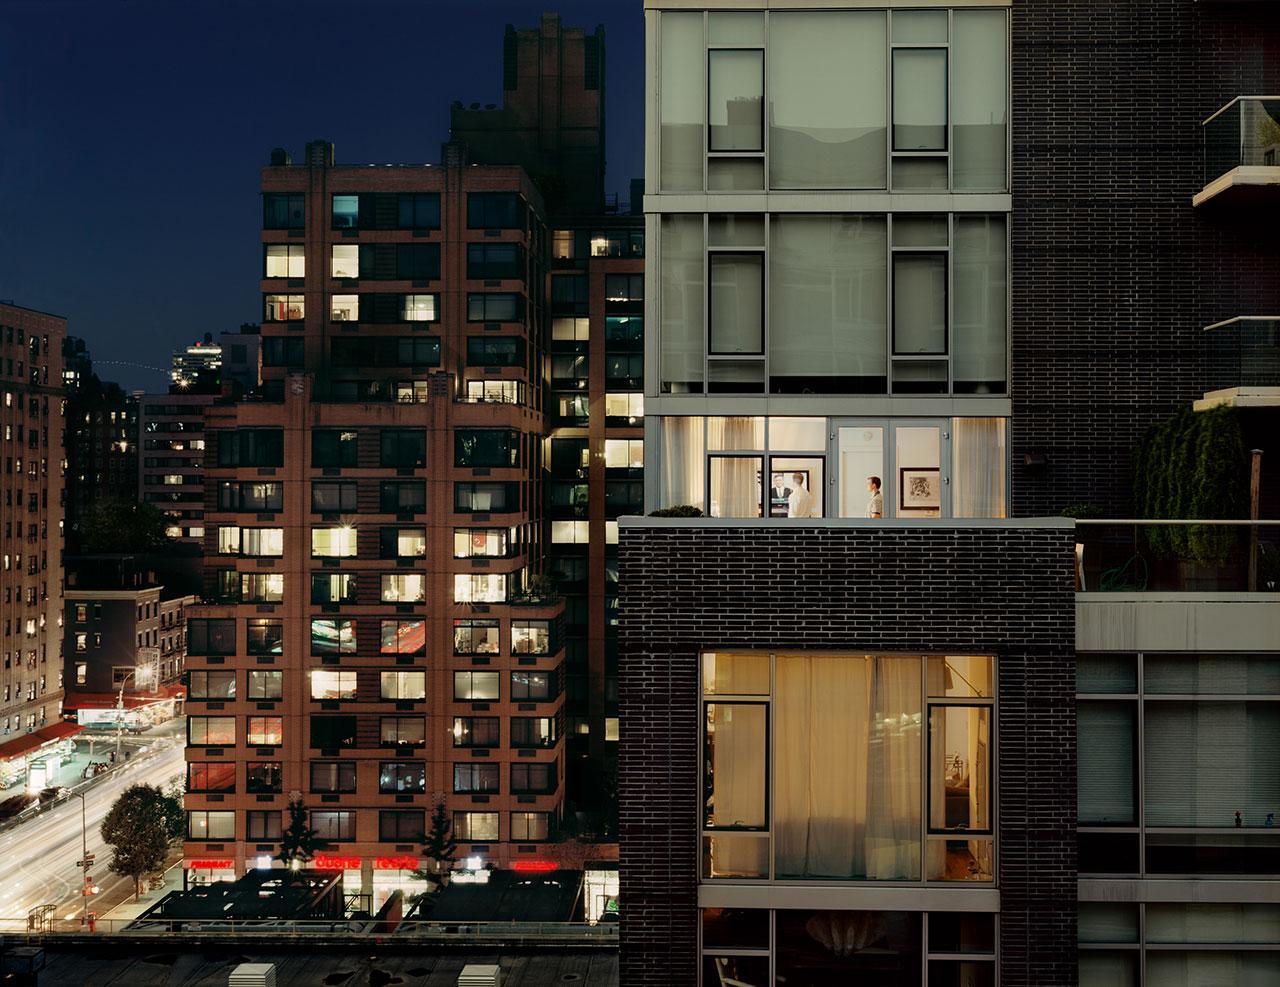 out_my_window_gail_albert_halaban_new_york_glasshousetv